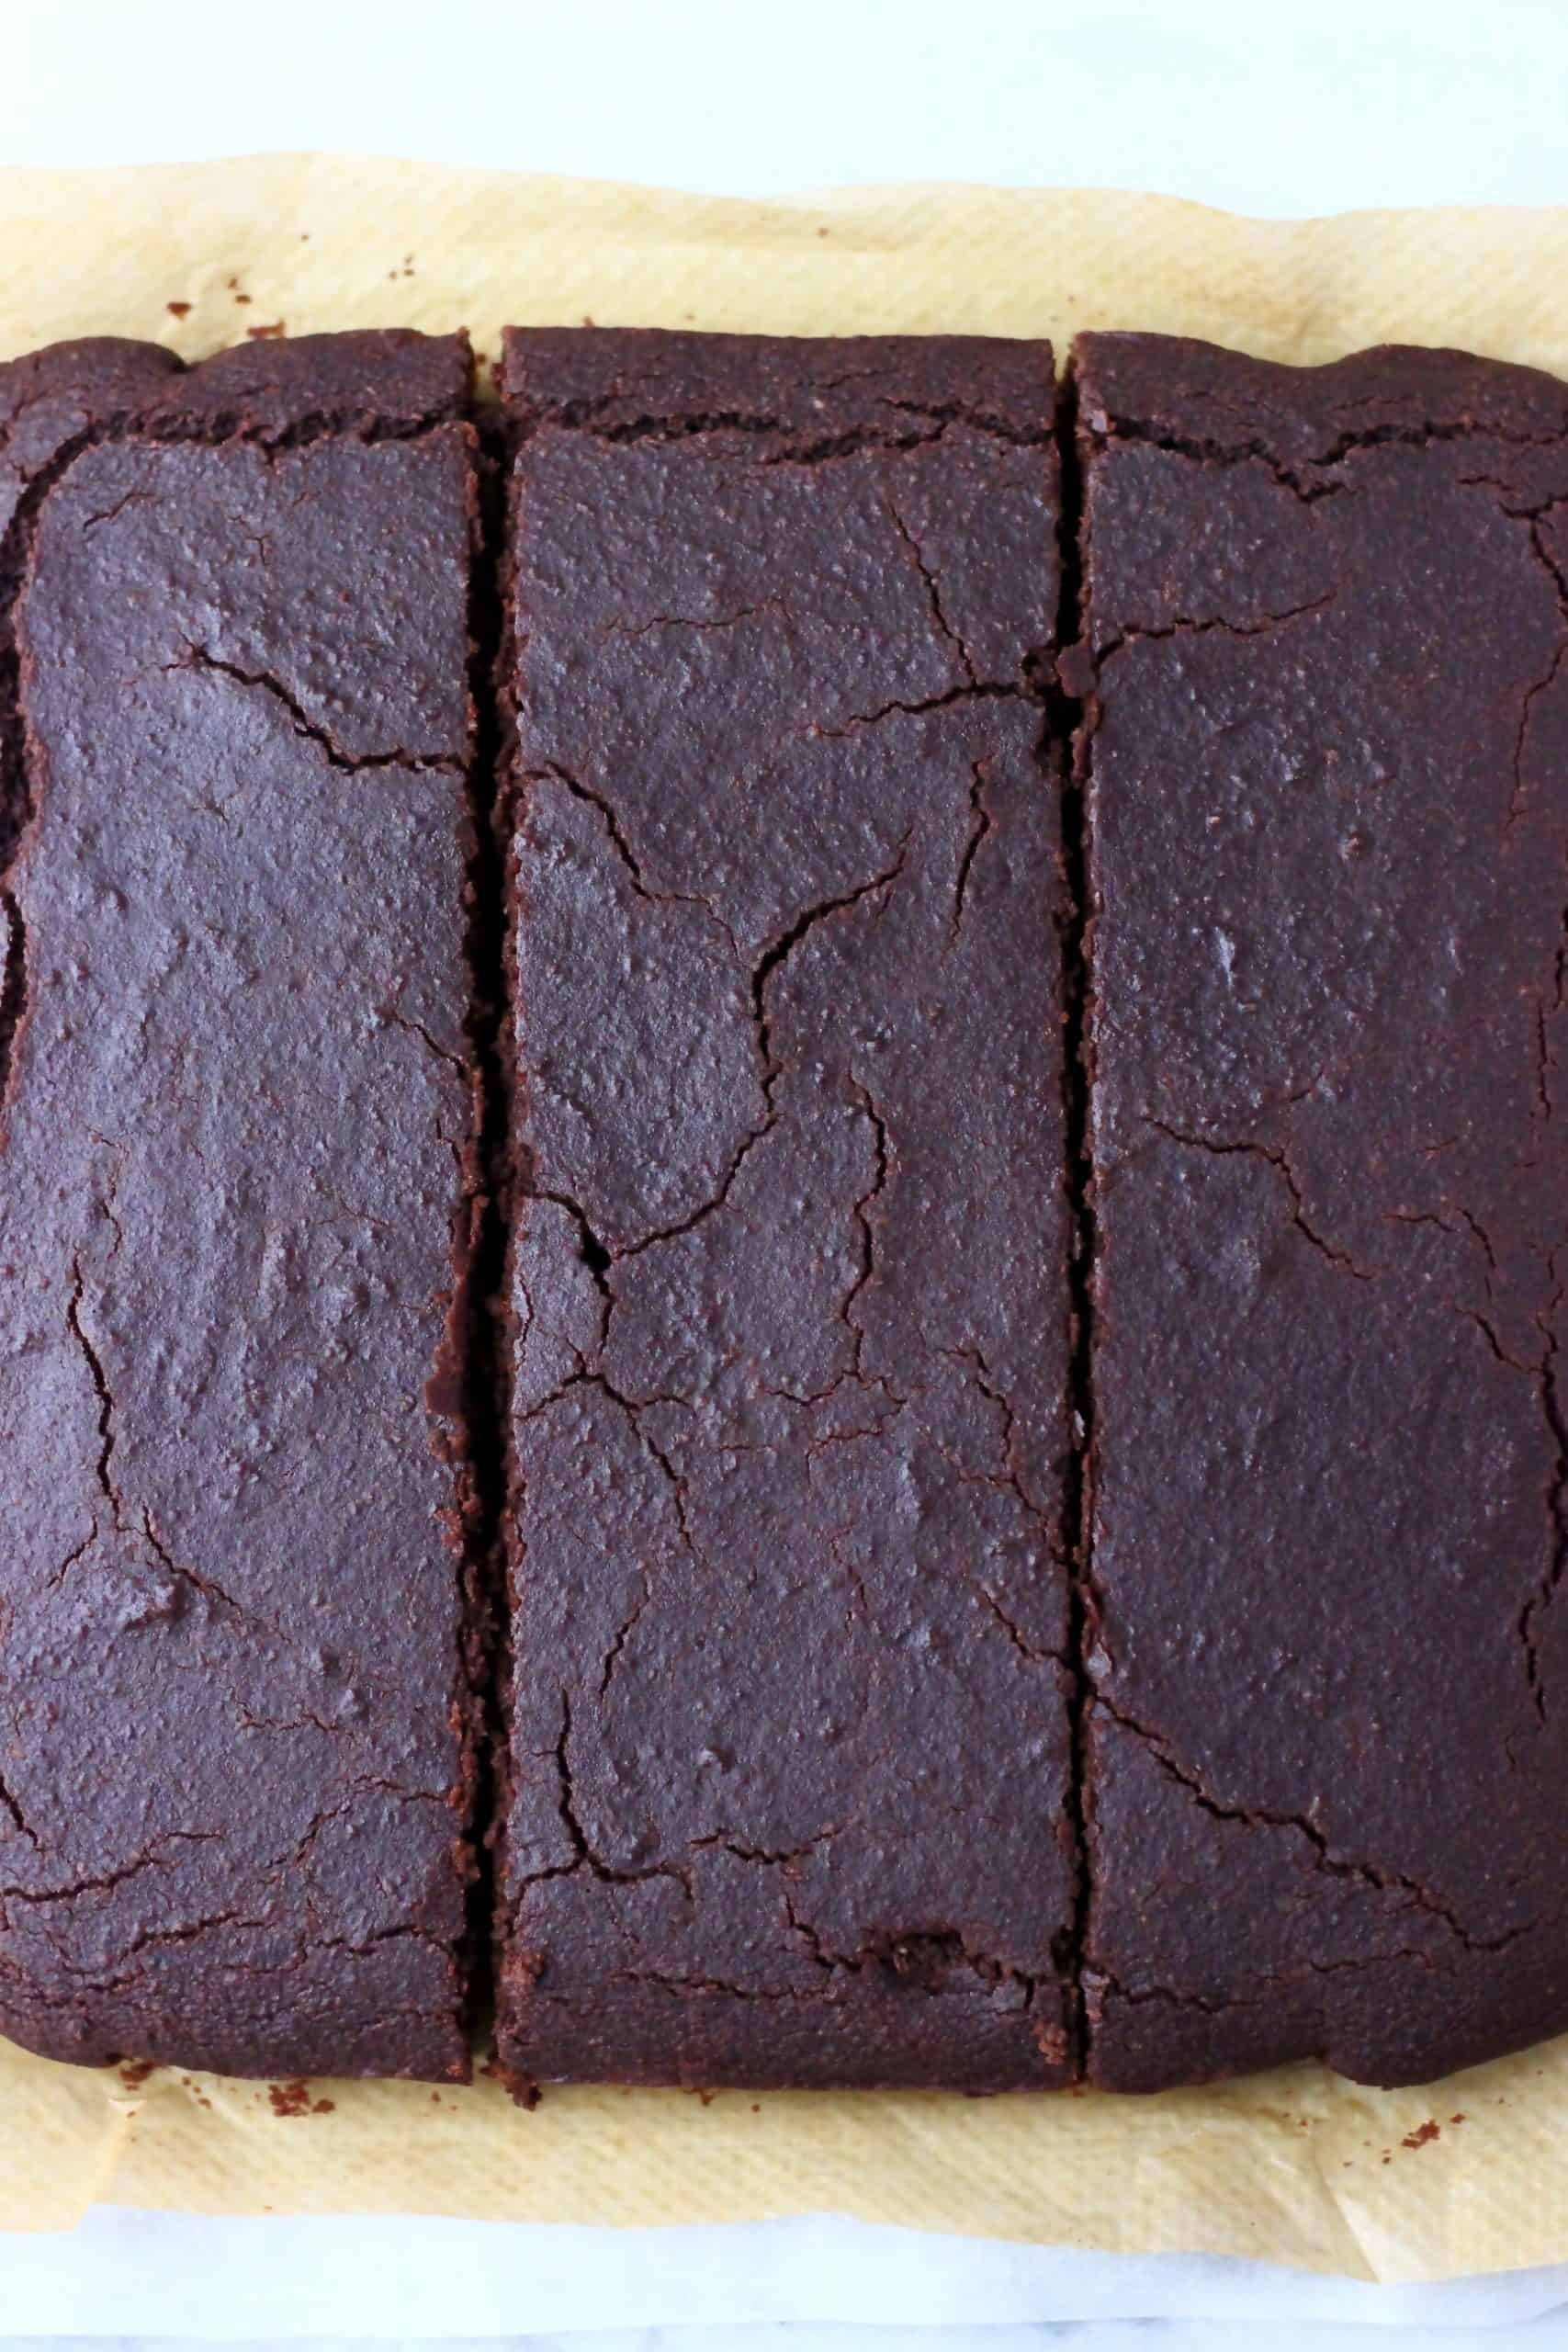 Square vegan chocolate sponge cake cut into three